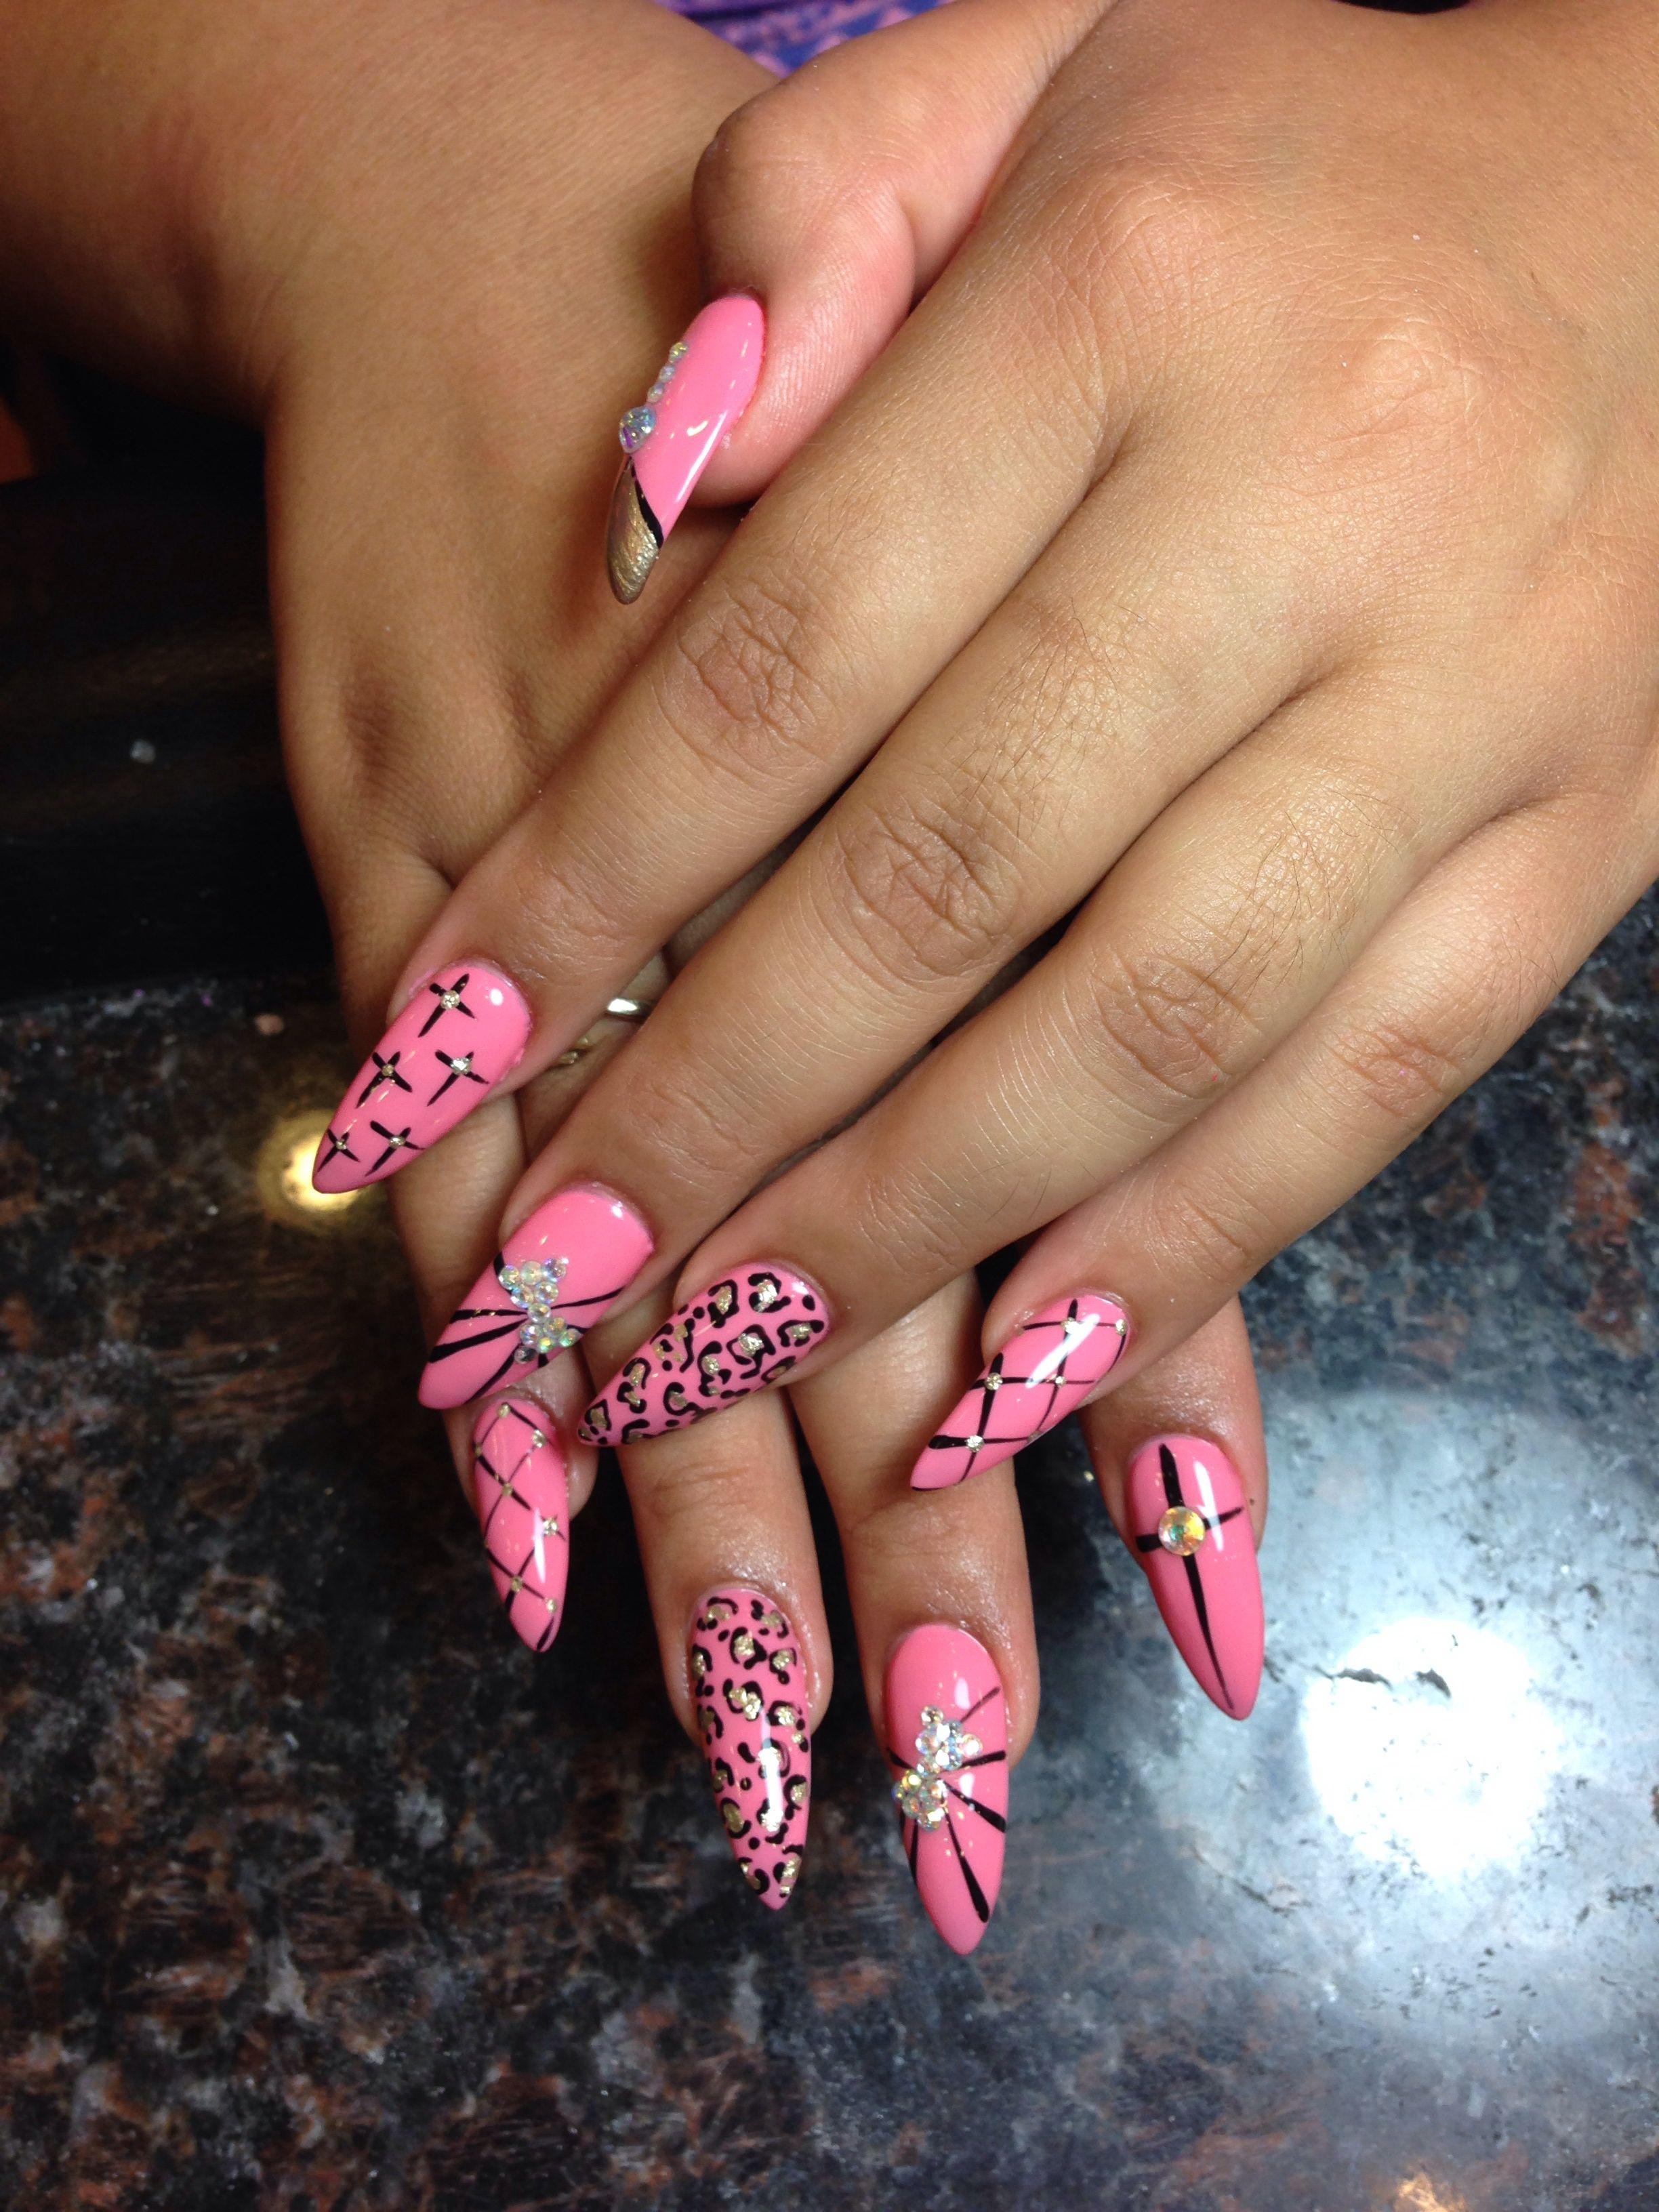 Capital Nails : capital, nails, Capital, Nails, Design, Nails,, Designs,